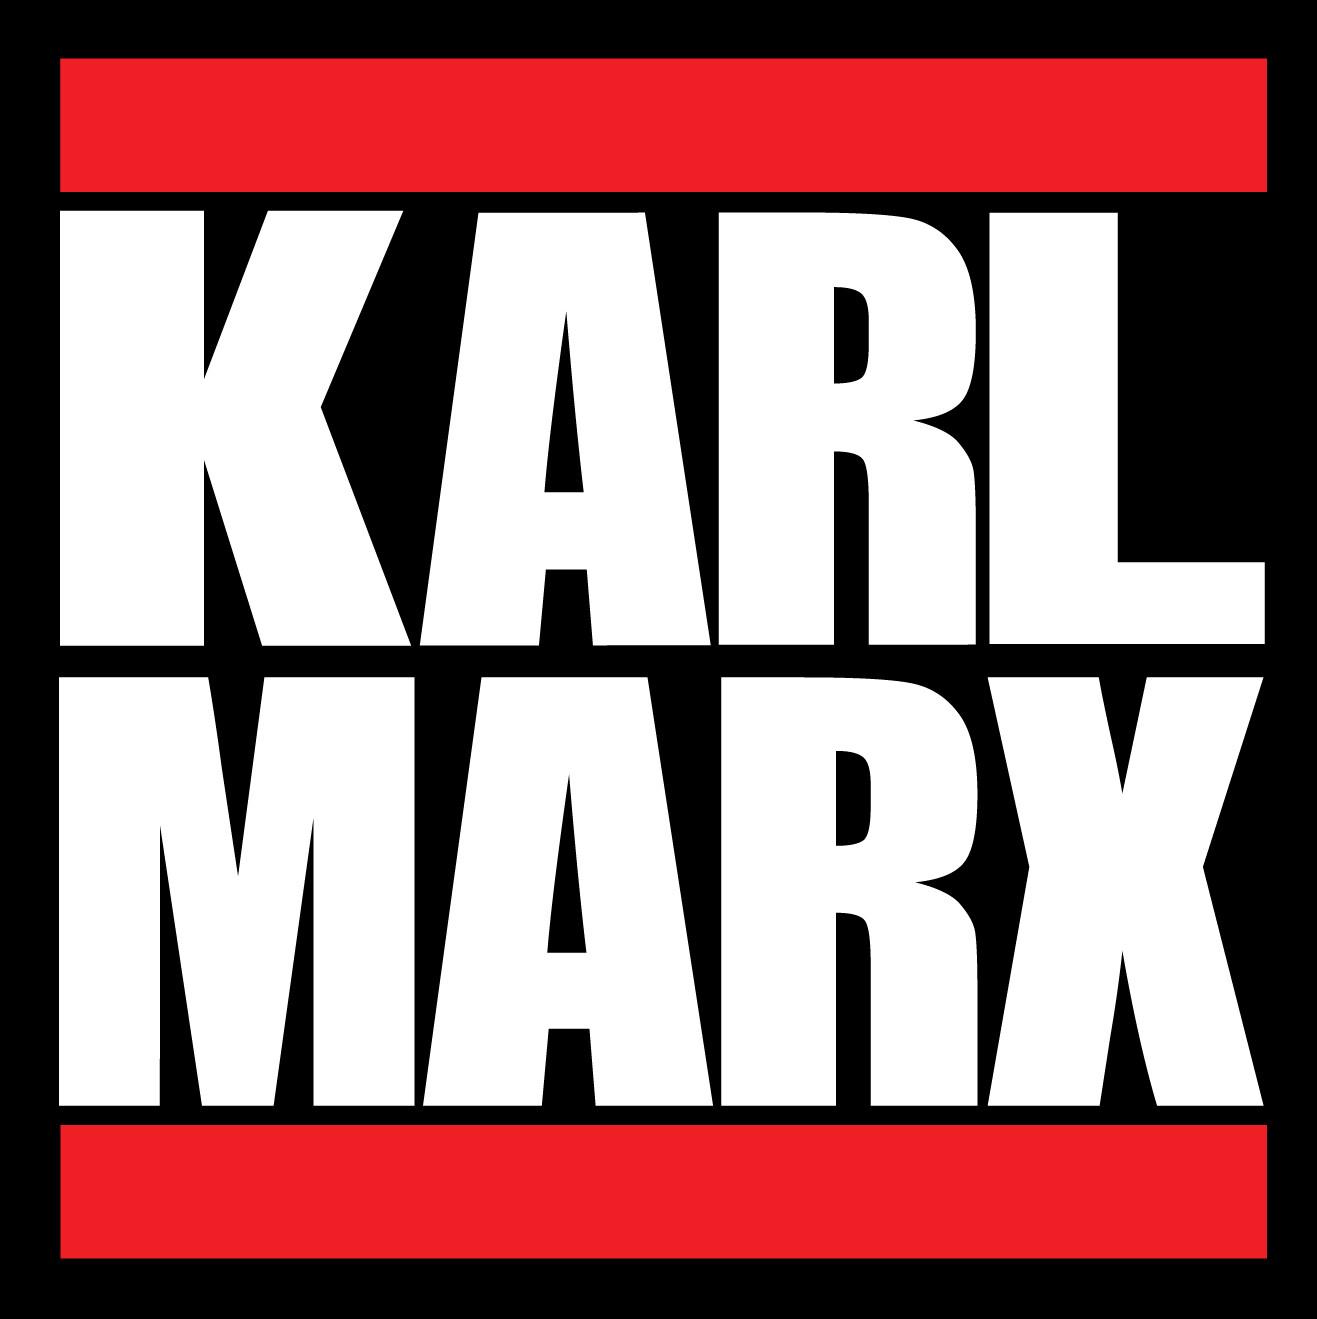 The final version of the Karl Marx/Run DMC hybrid sticker